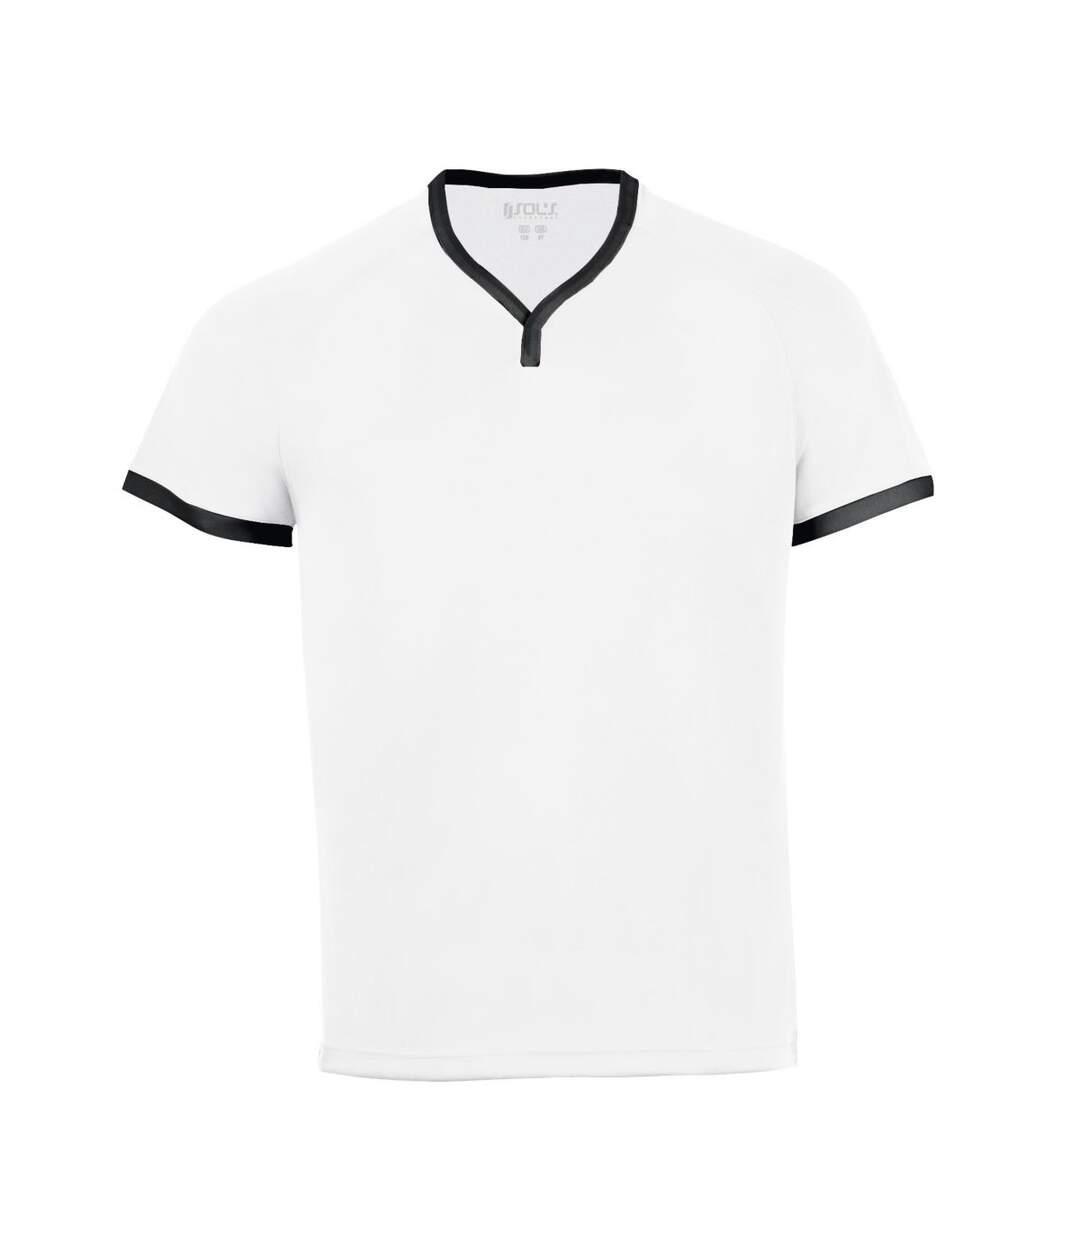 SOLS Atletico - T-shirt à col en V - Homme (Blanc) - UTPC2160